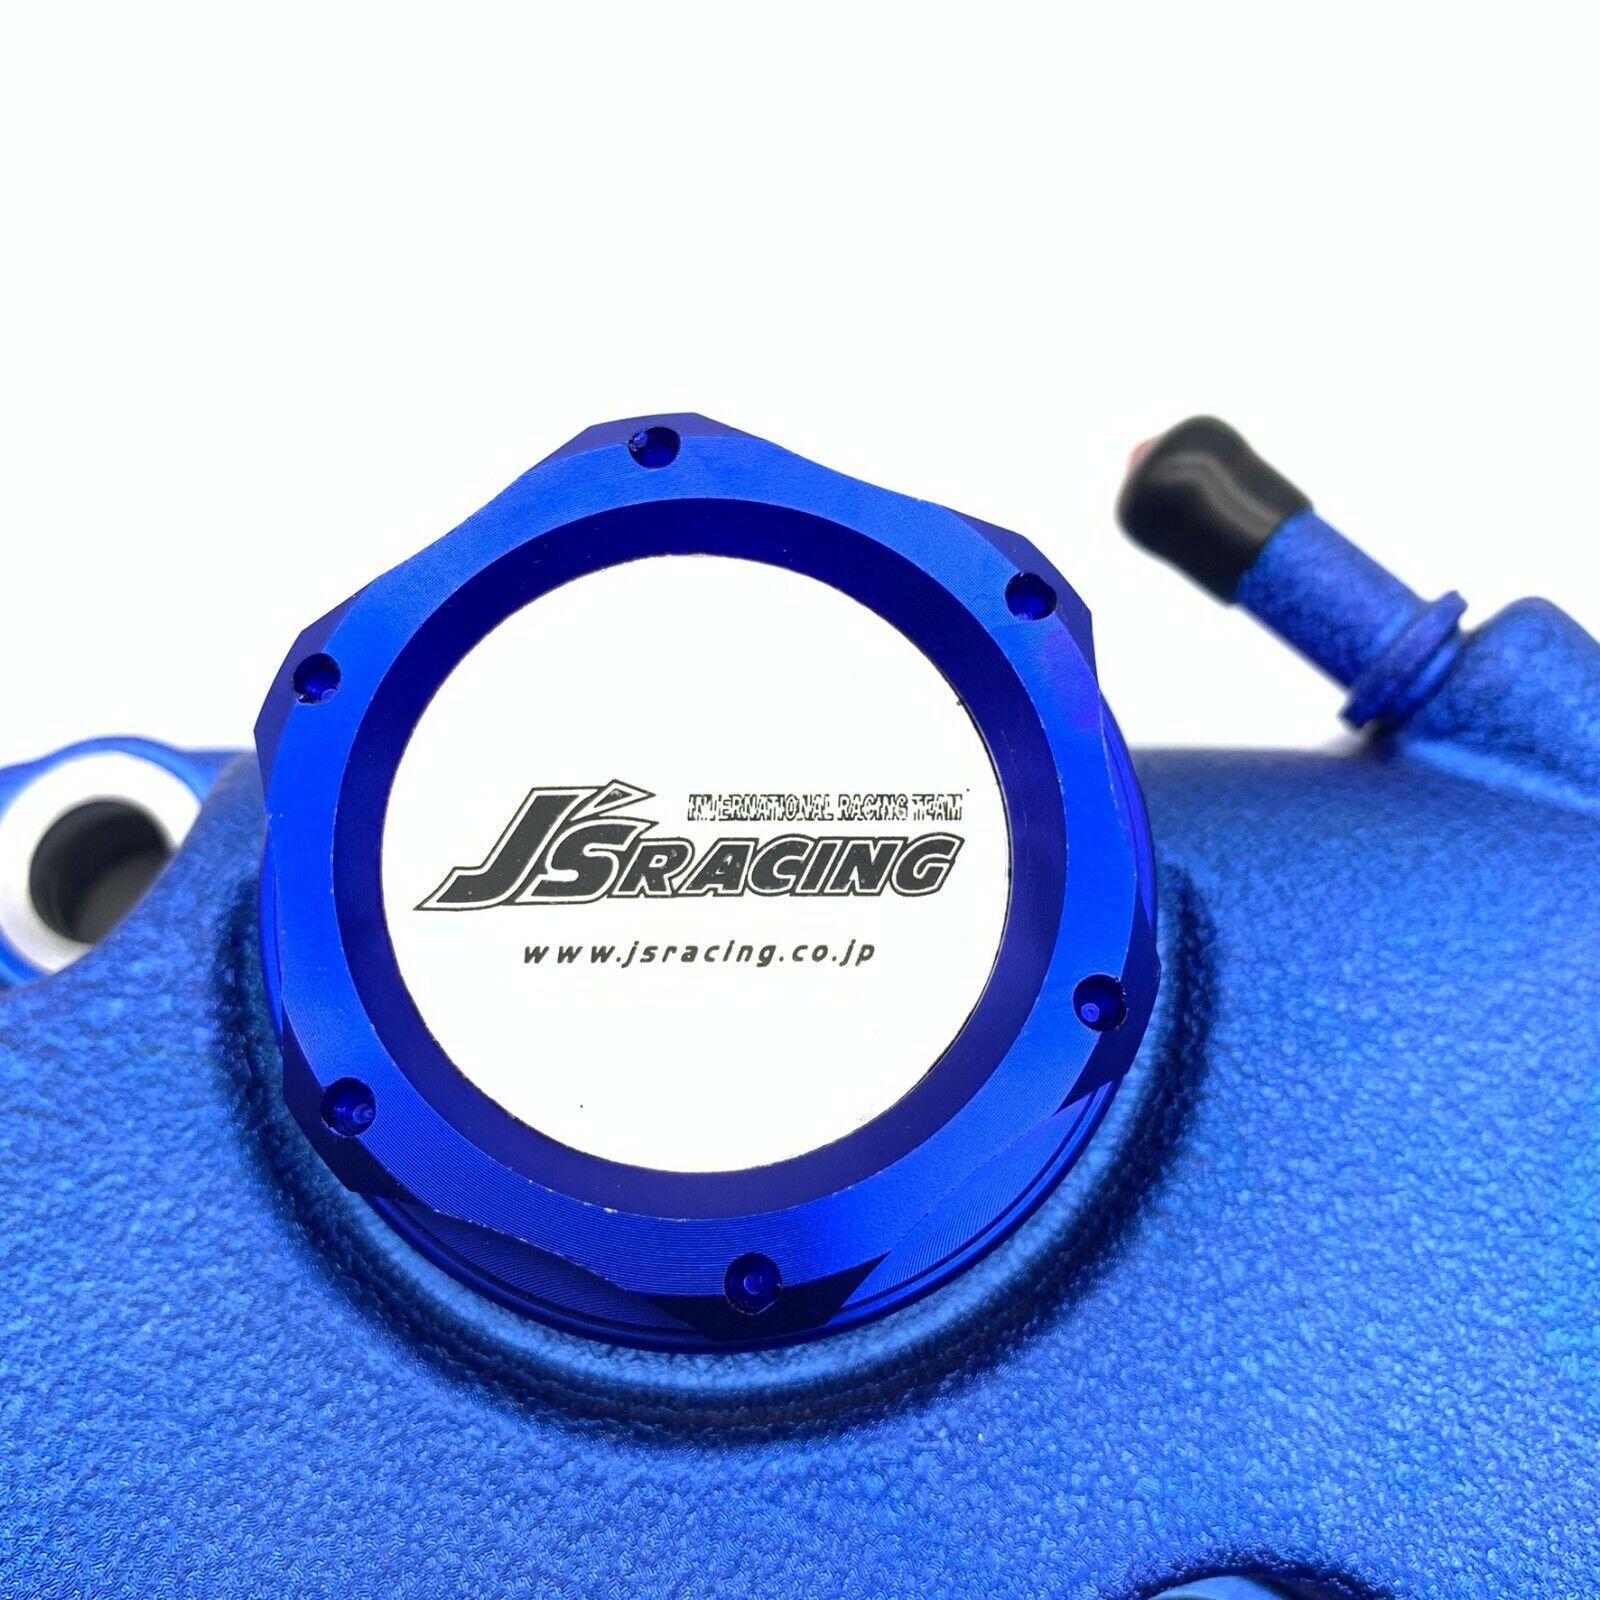 JDM Engine Oil Filler Tank Cap Cover Fits Honda Civic Accord Acura Integra Blue